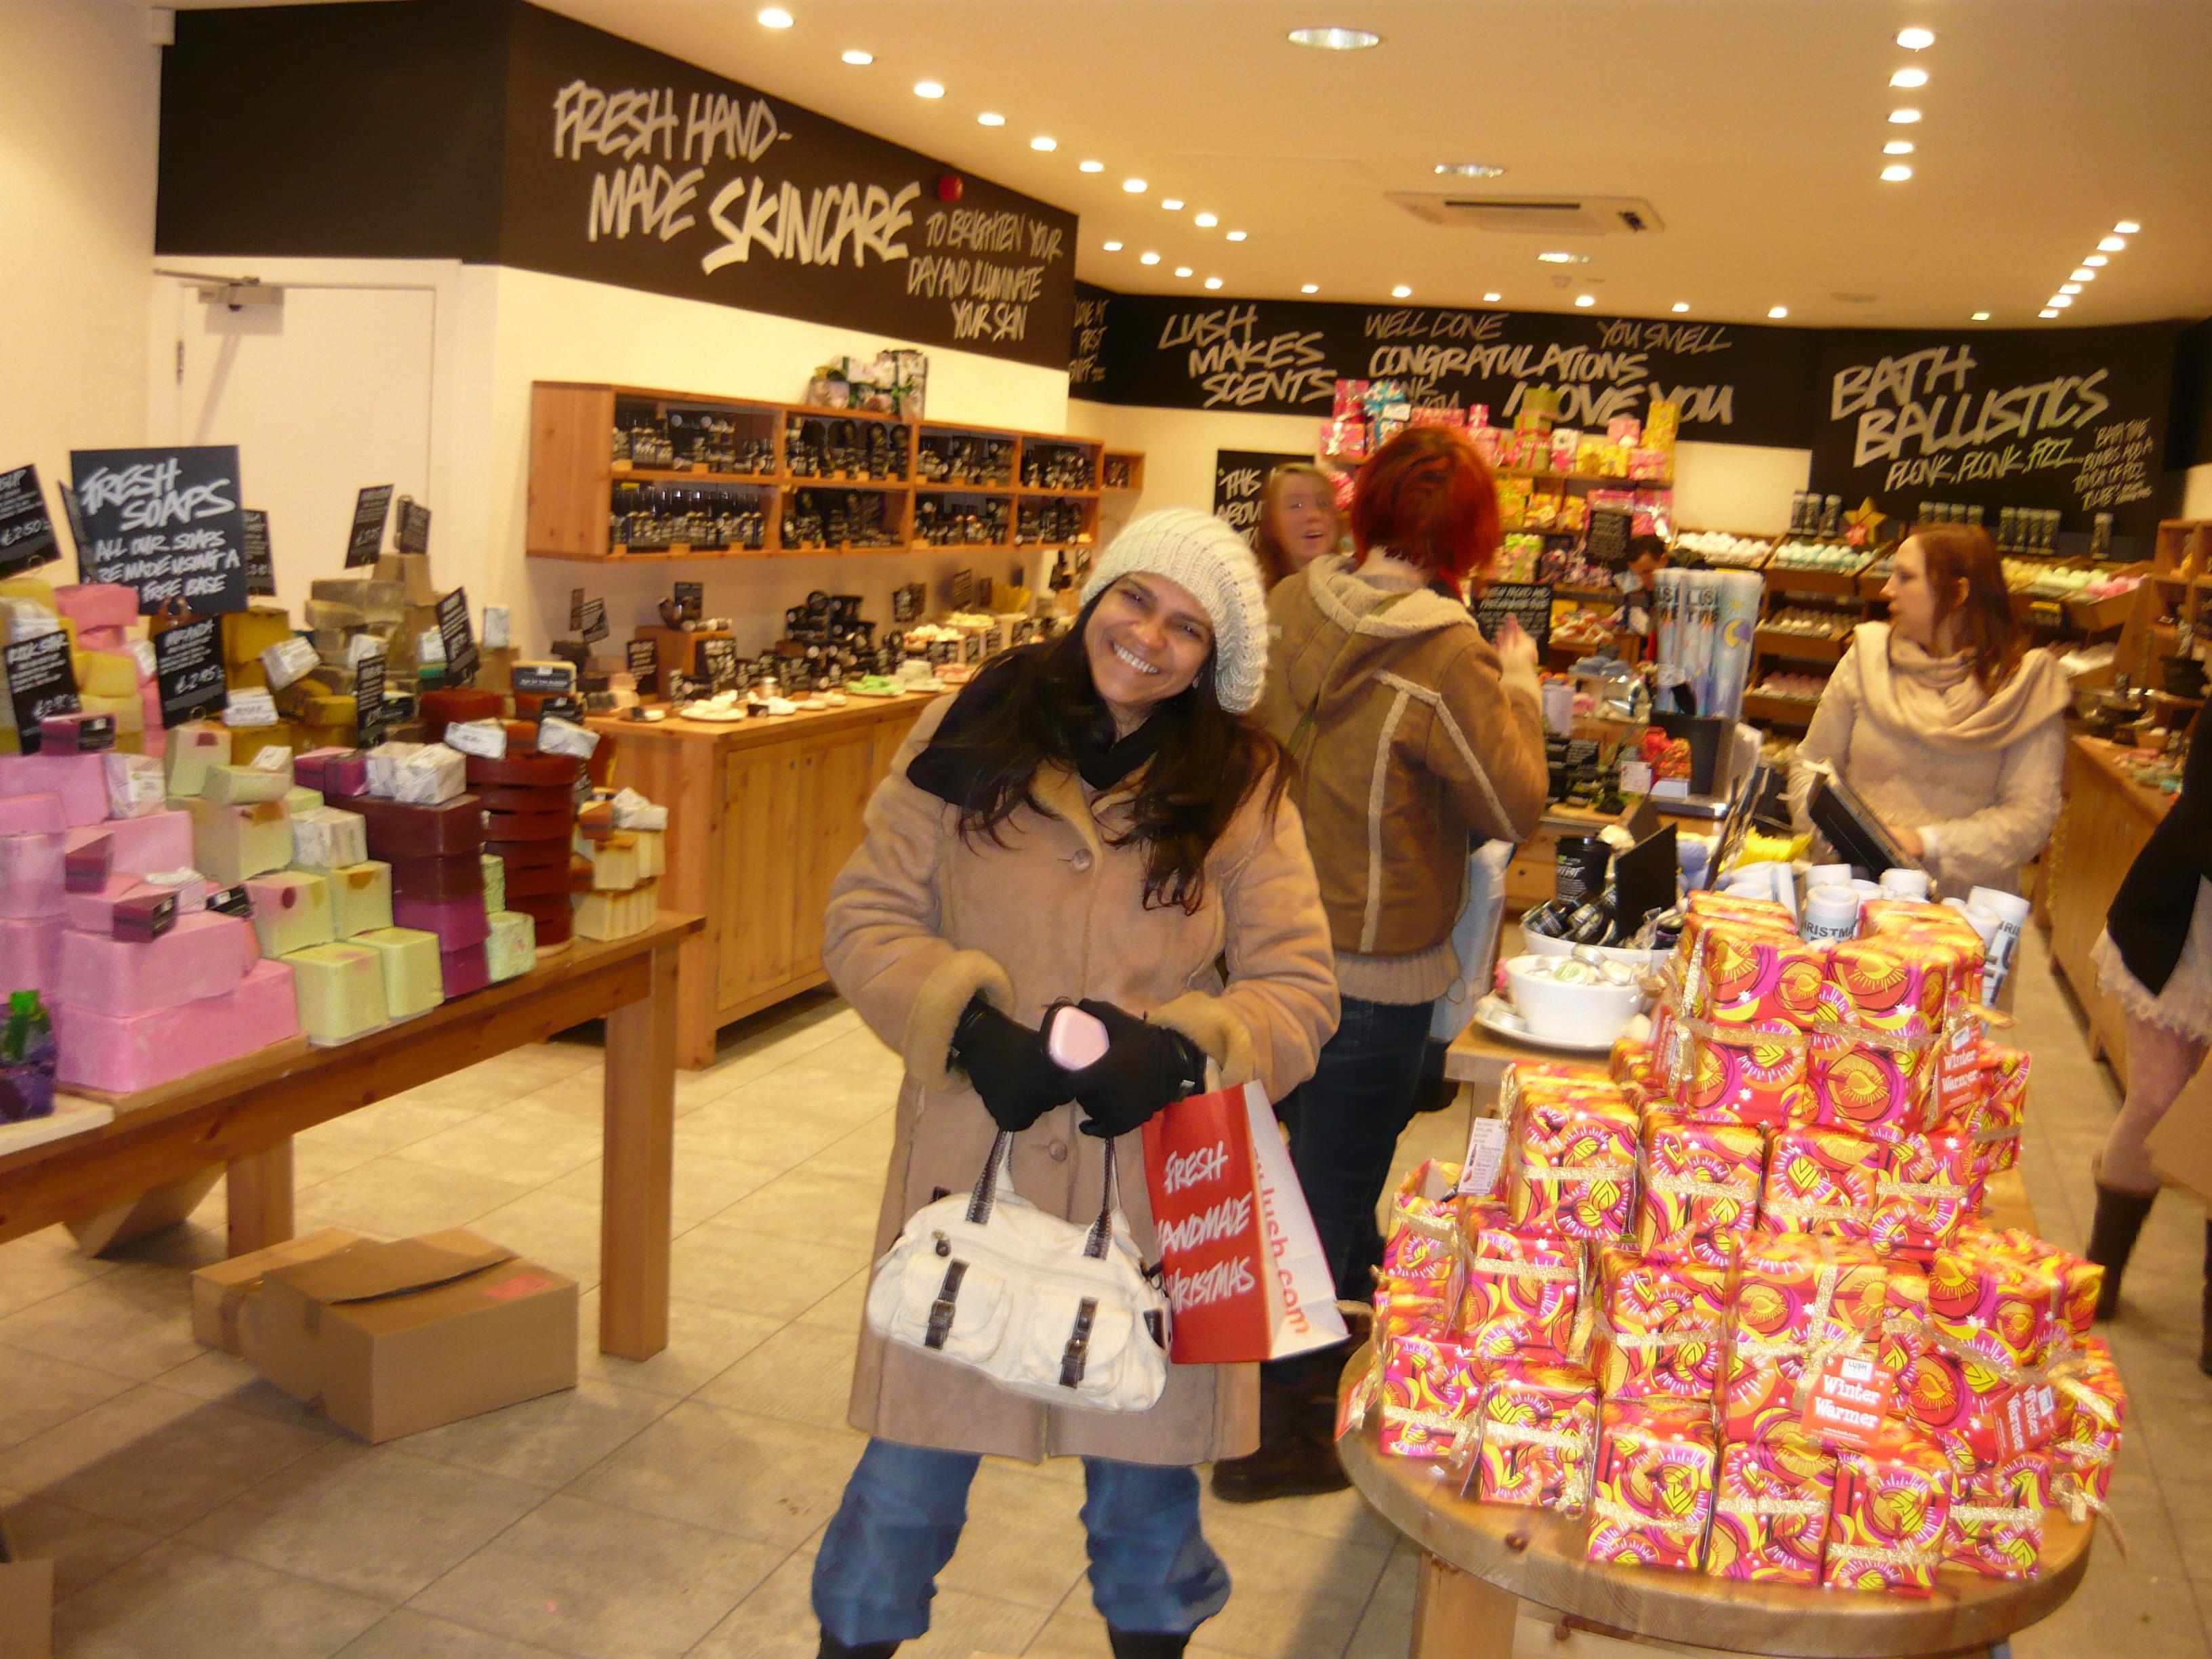 Loja cheirosa Inverness